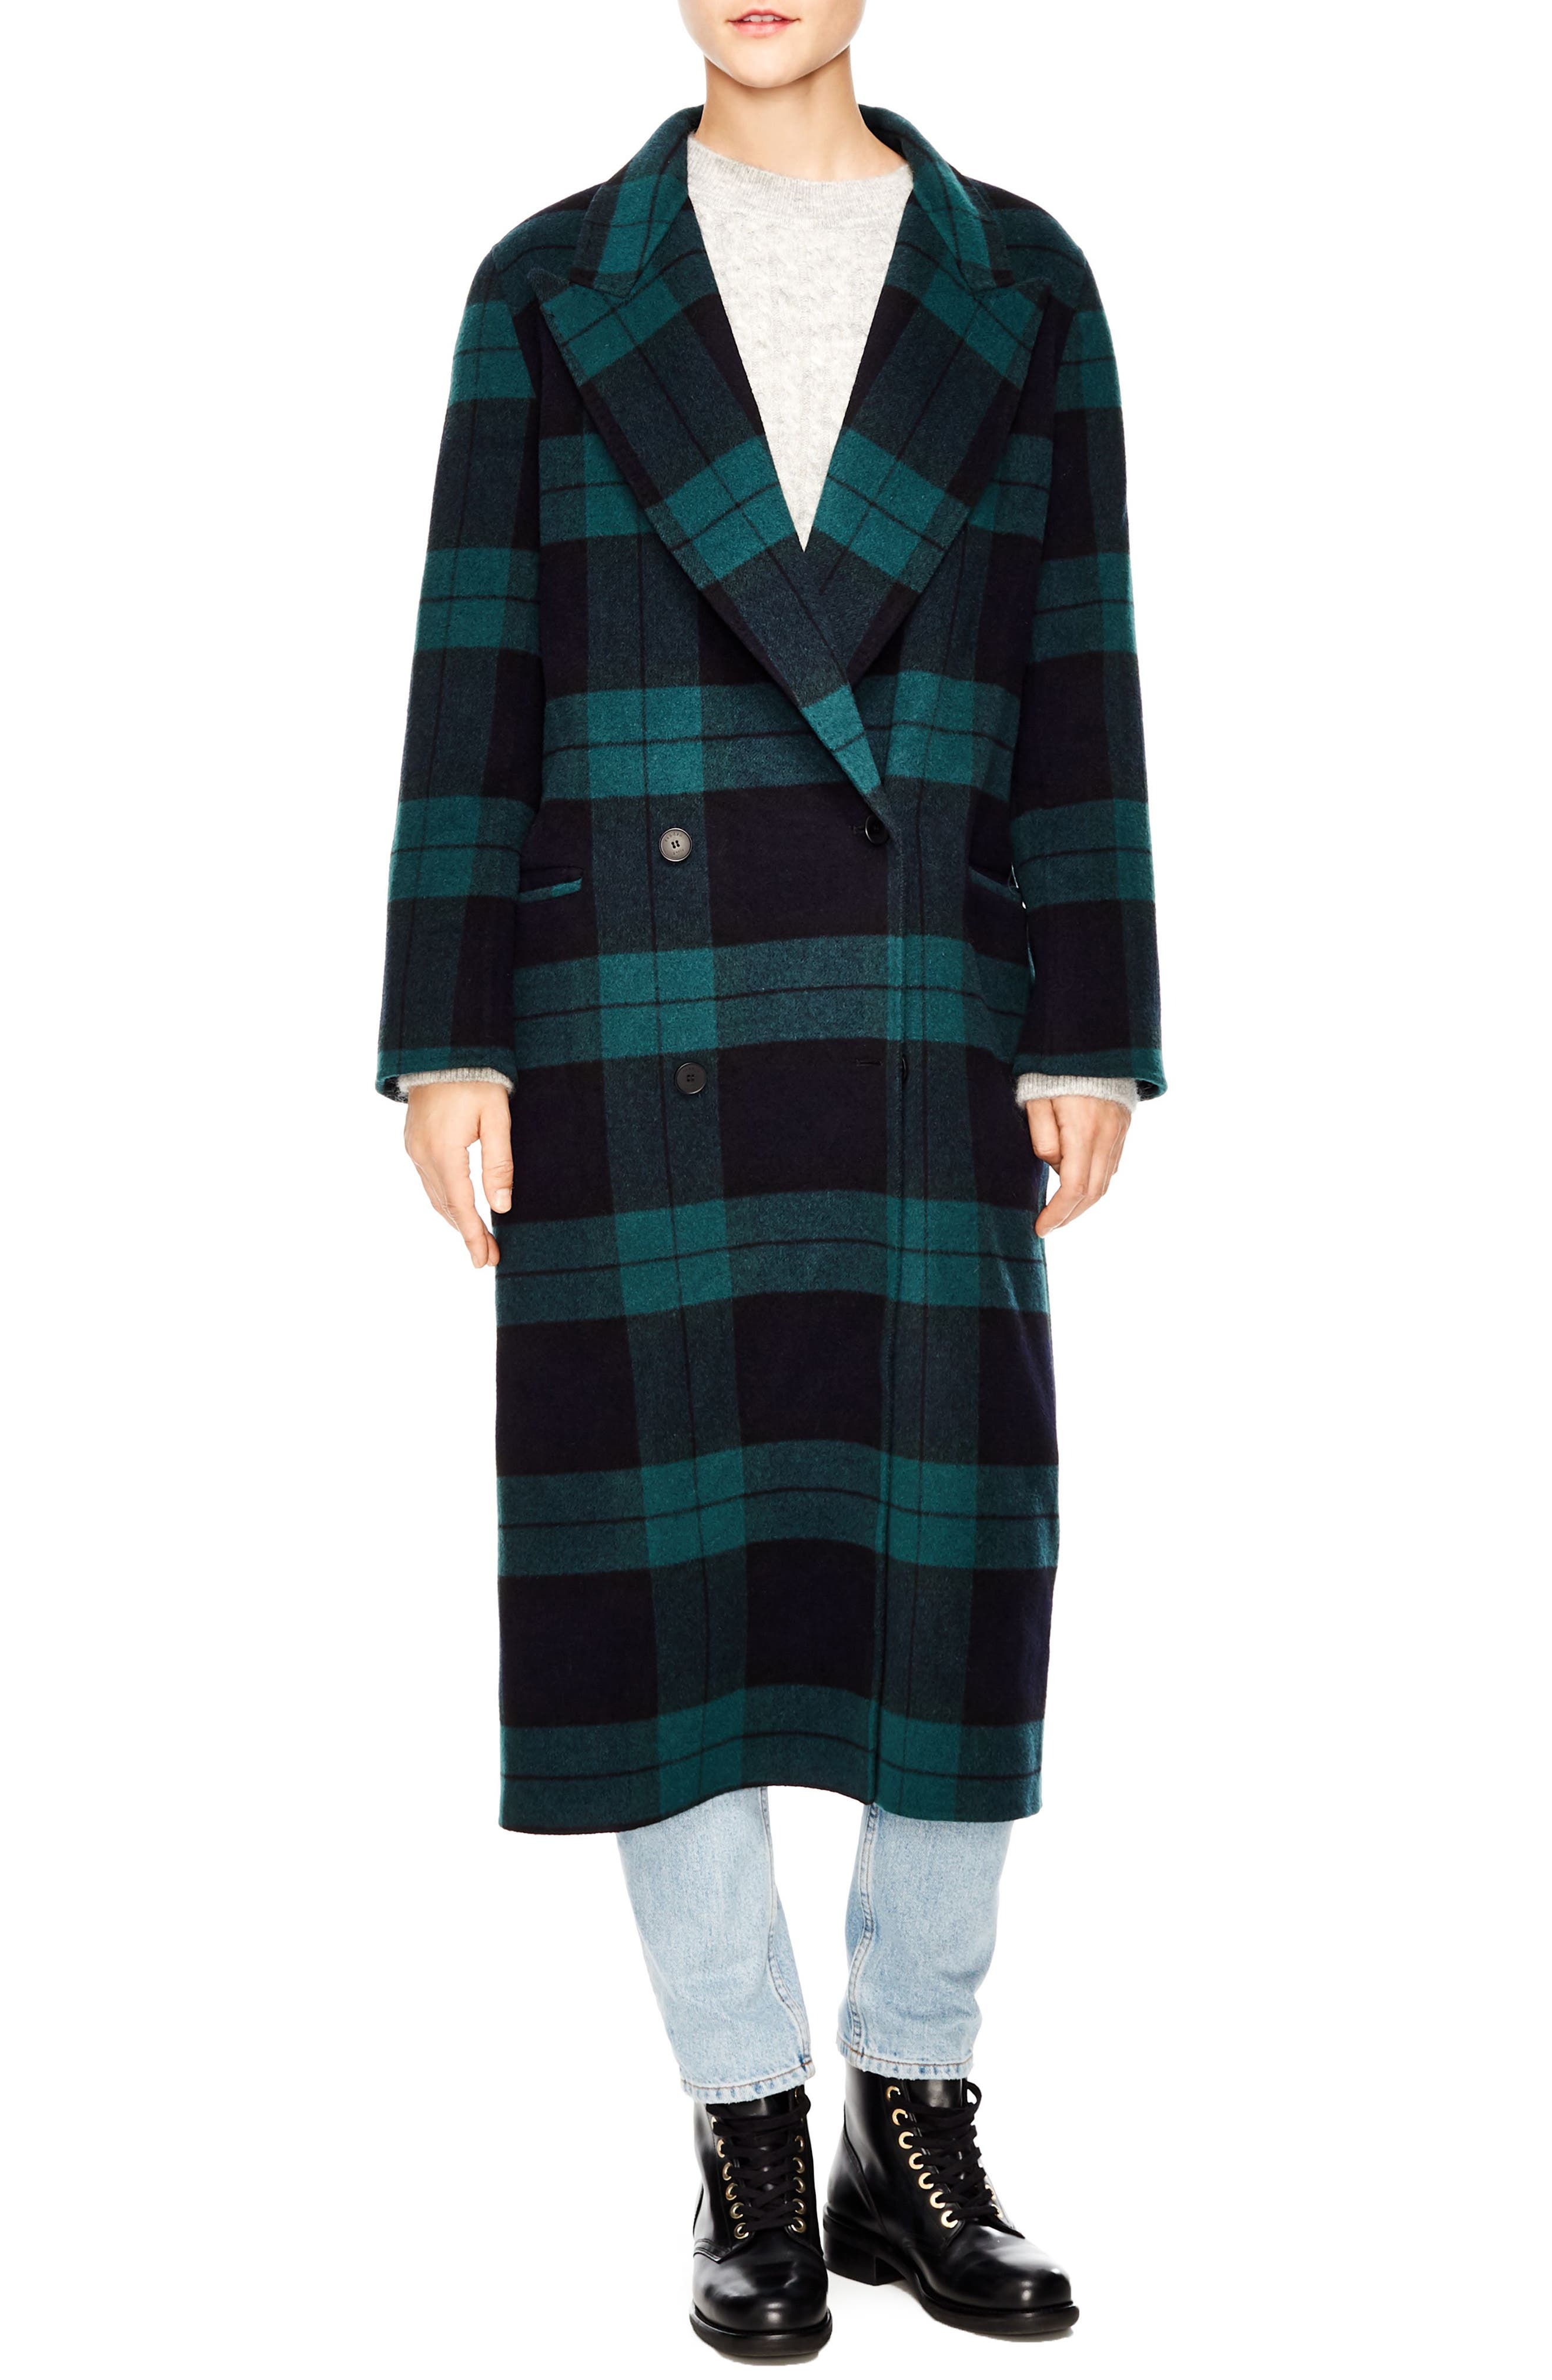 Pense Plaid Wool Blend Coat,                             Main thumbnail 1, color,                             GREEN